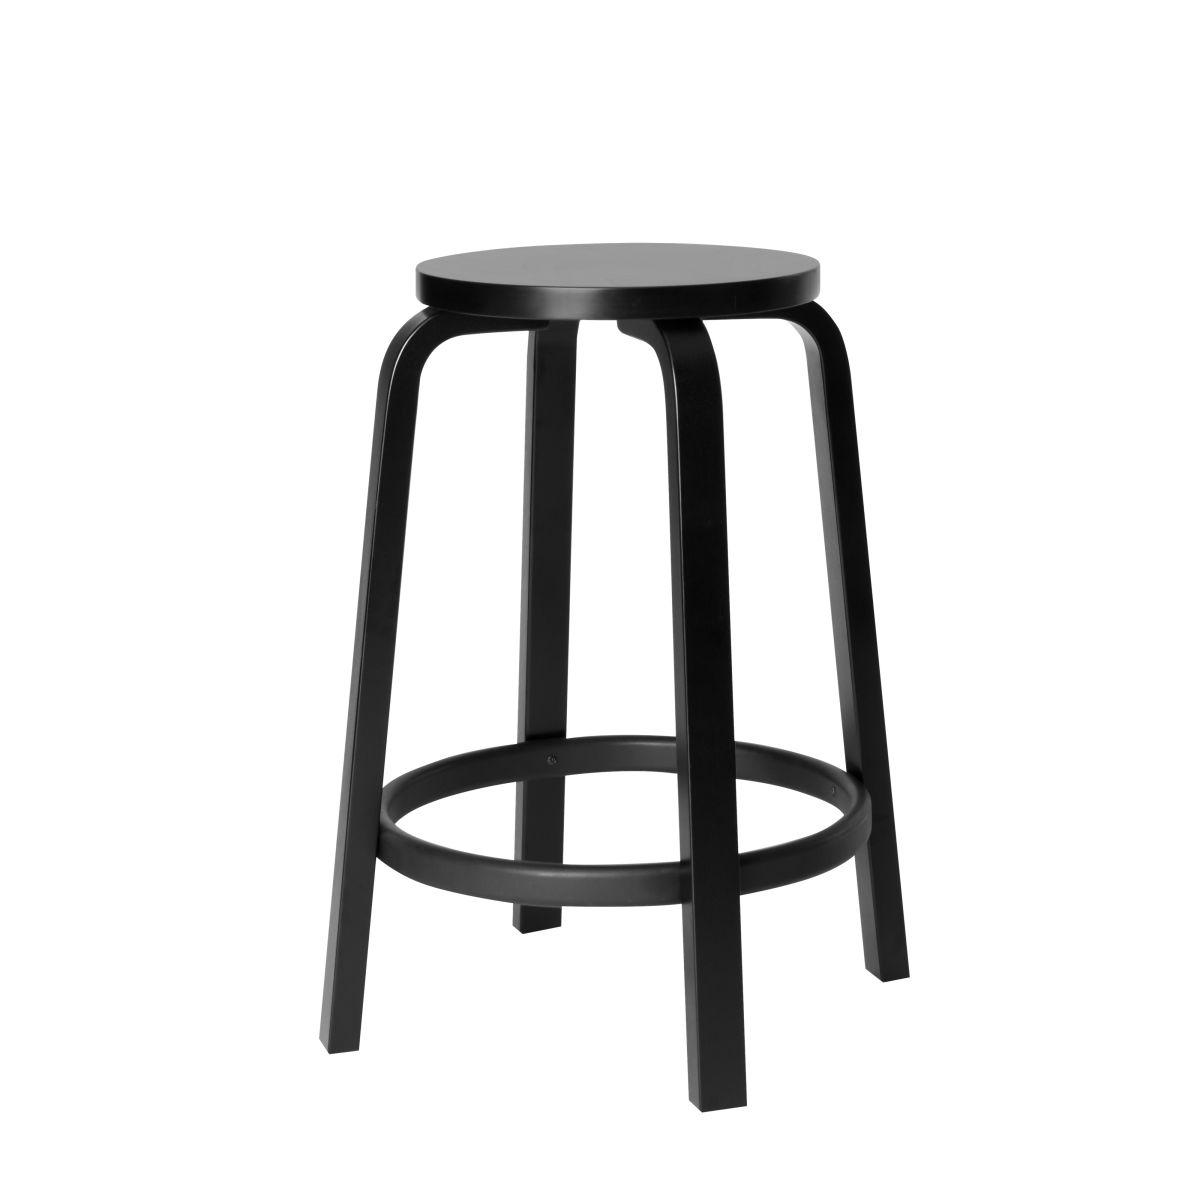 Bar Stool 64 black lacquer_cut_out_65cm